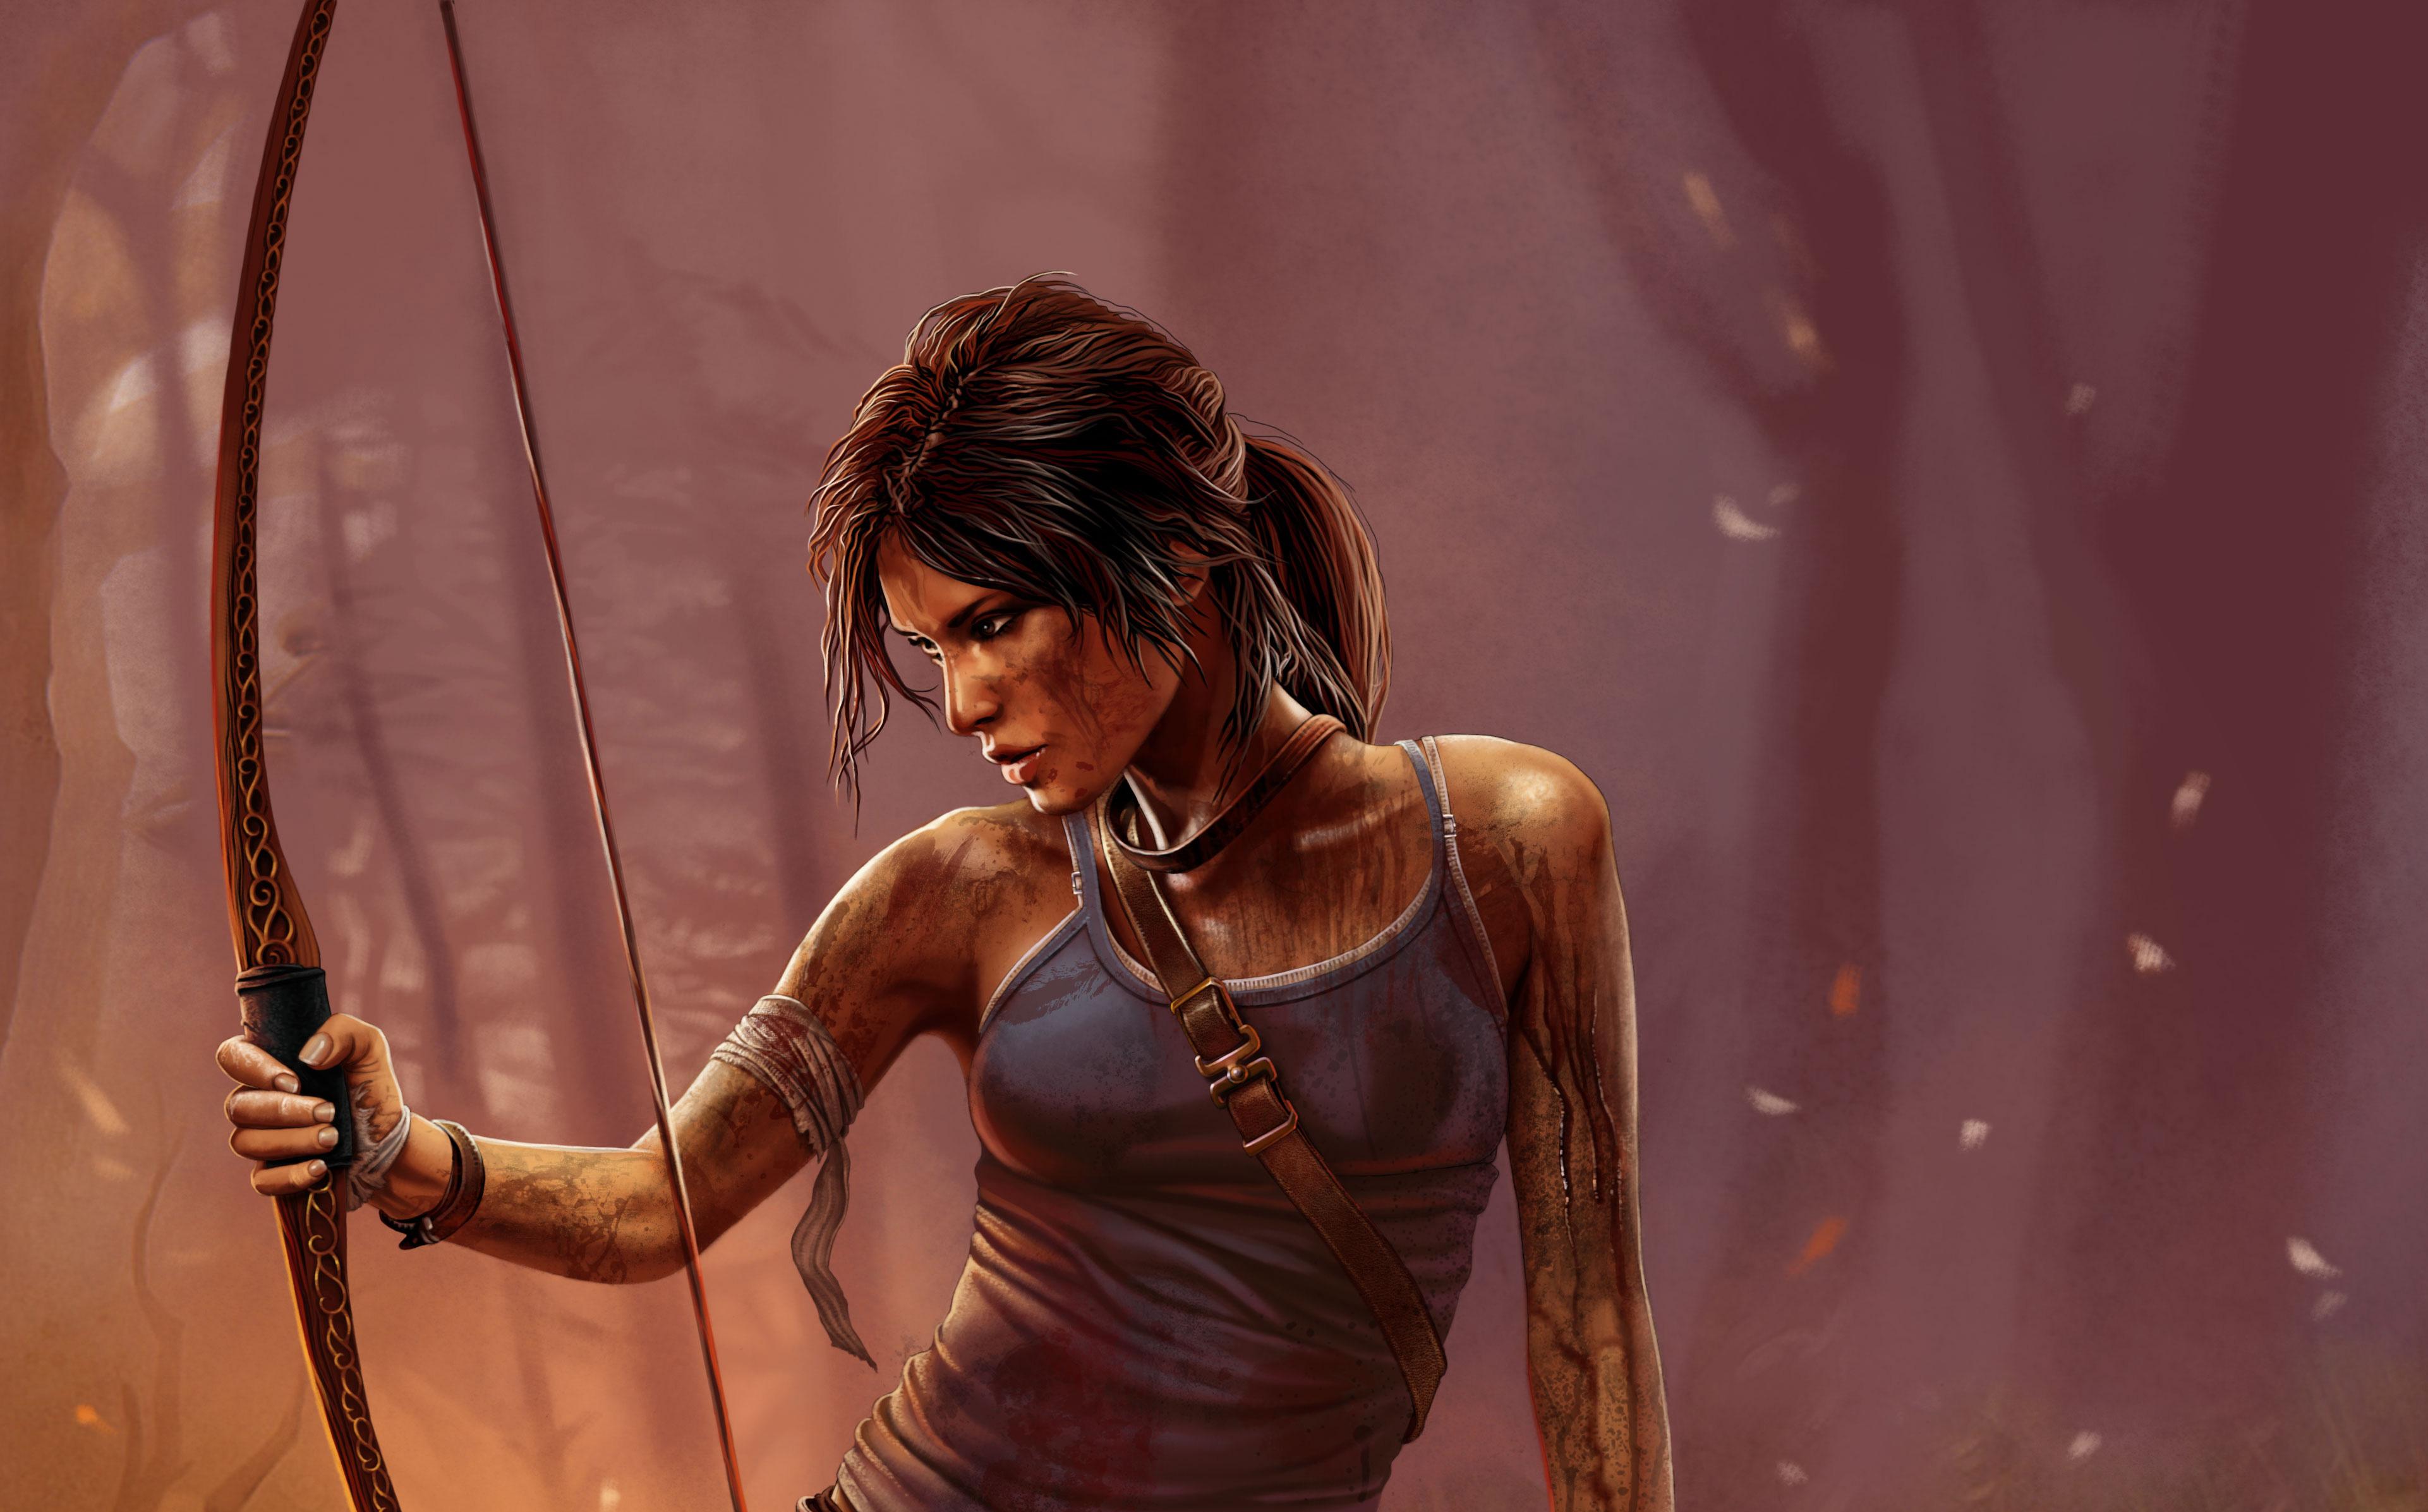 3840x2160 Lara Croft Tomb Raider Artwork 4k Hd 4k: 4k Lara Croft Tomb Raider, HD Games, 4k Wallpapers, Images